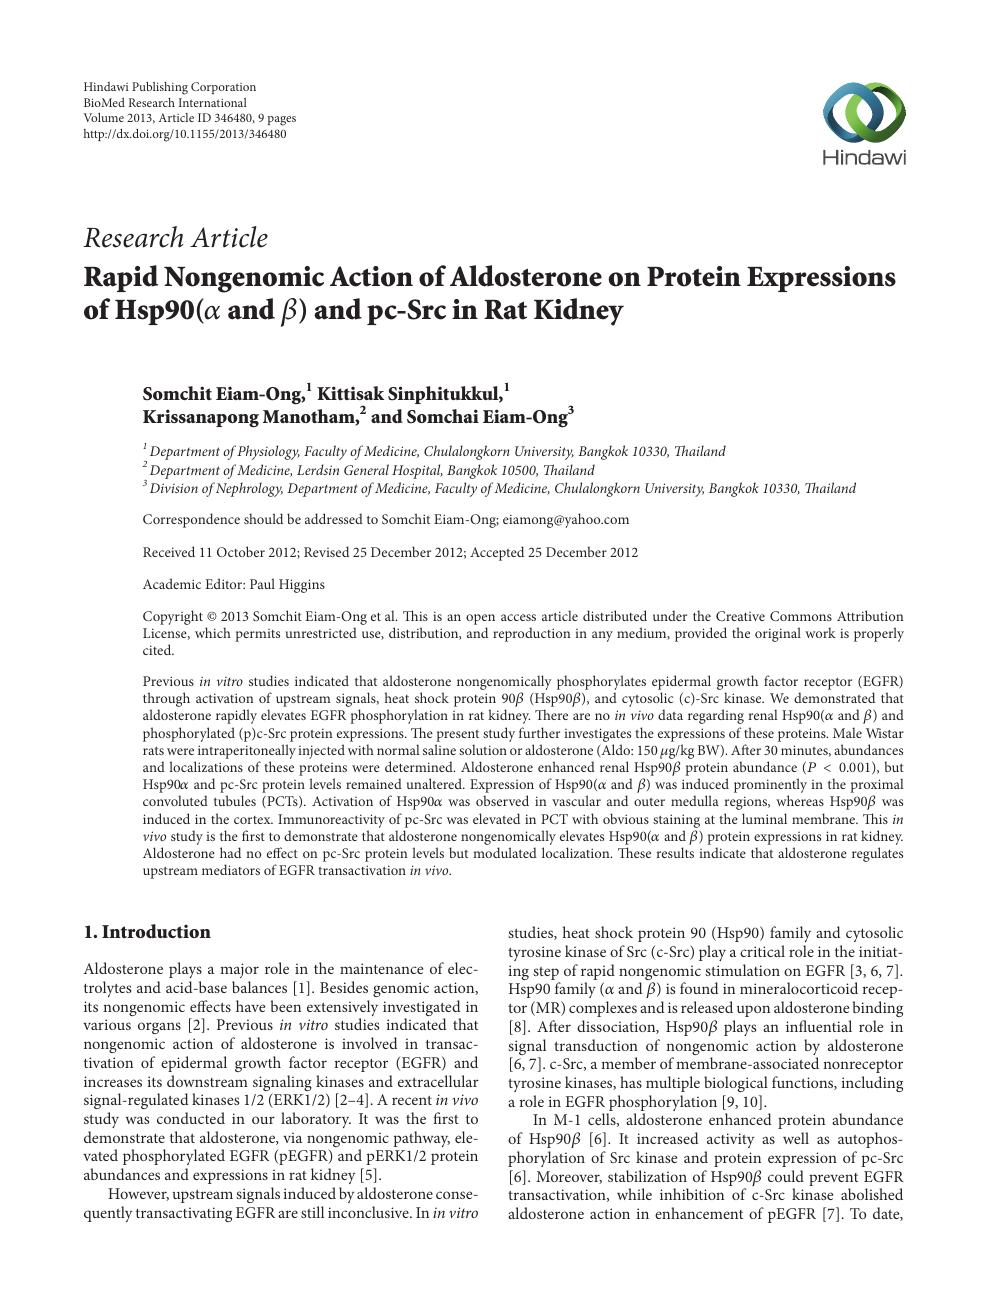 Rapid Nongenomic Action of Aldosterone on Protein